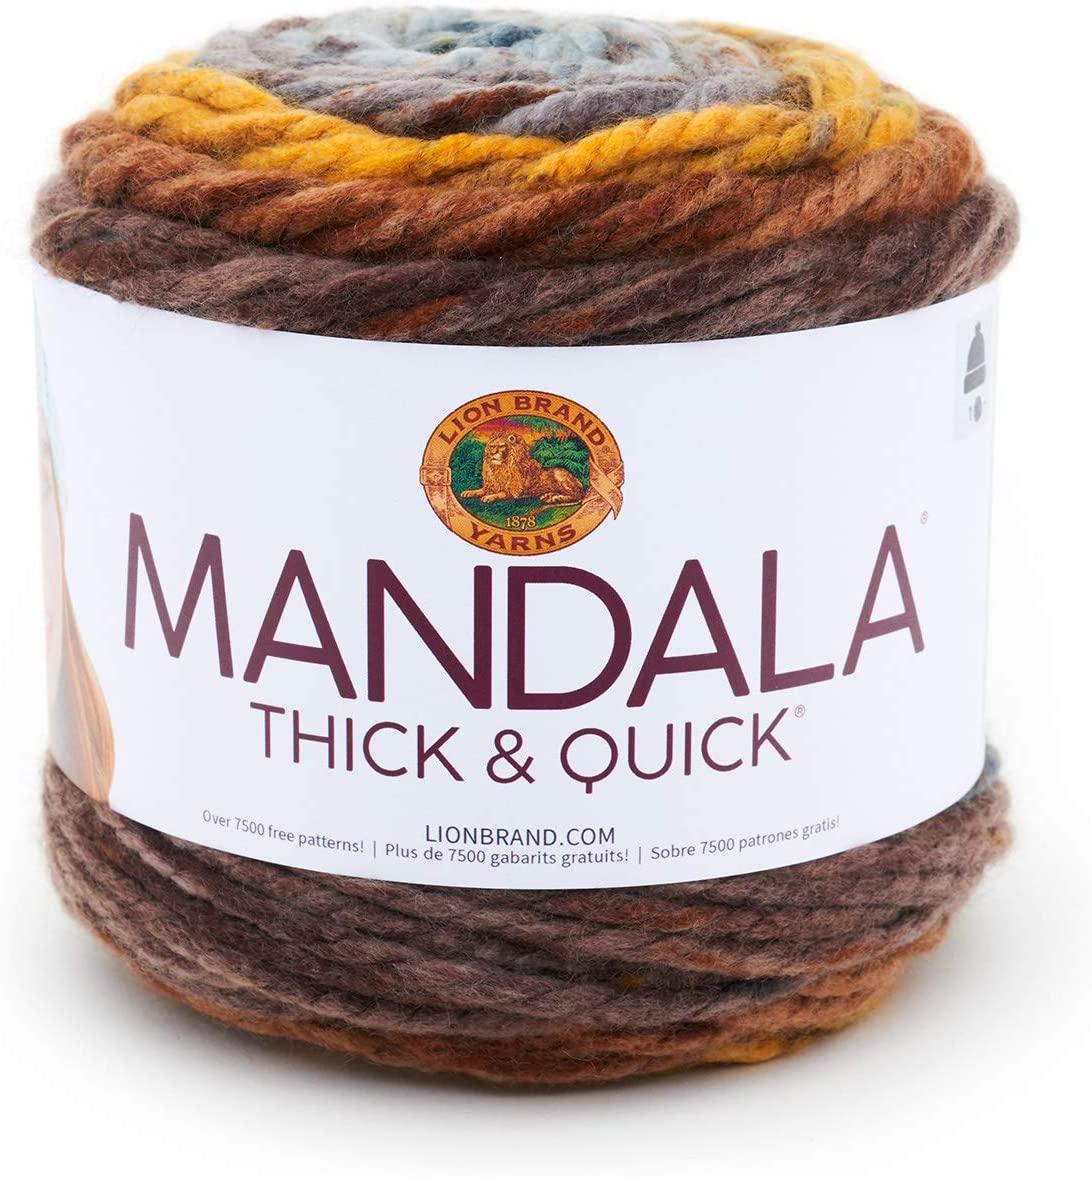 Lion Brand 528-209 Mandala Thick & Quick Yarn - Thumbprint